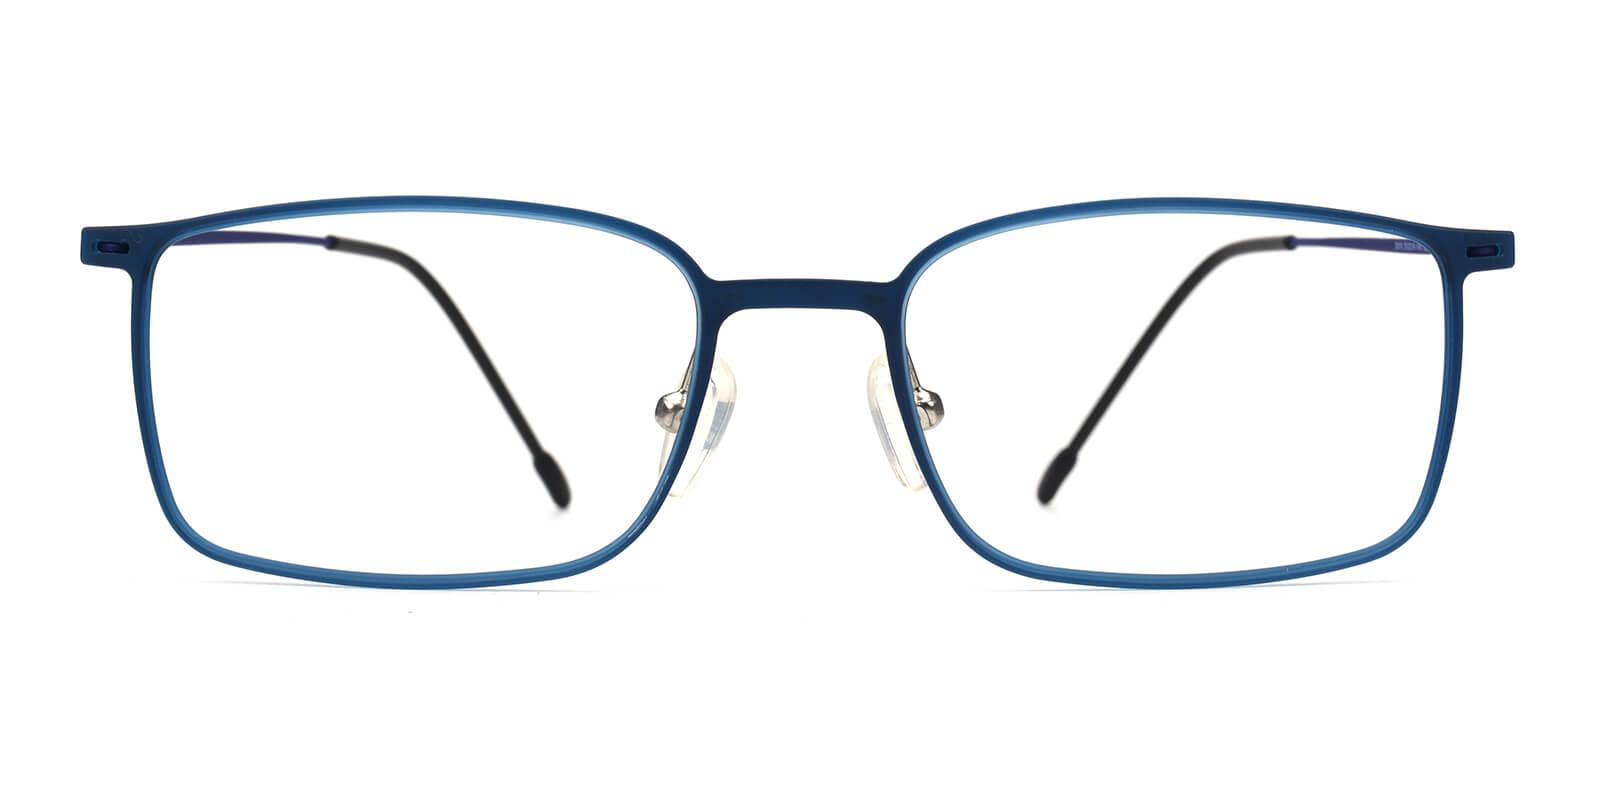 Glory-Blue-Rectangle-Combination-Eyeglasses-additional2